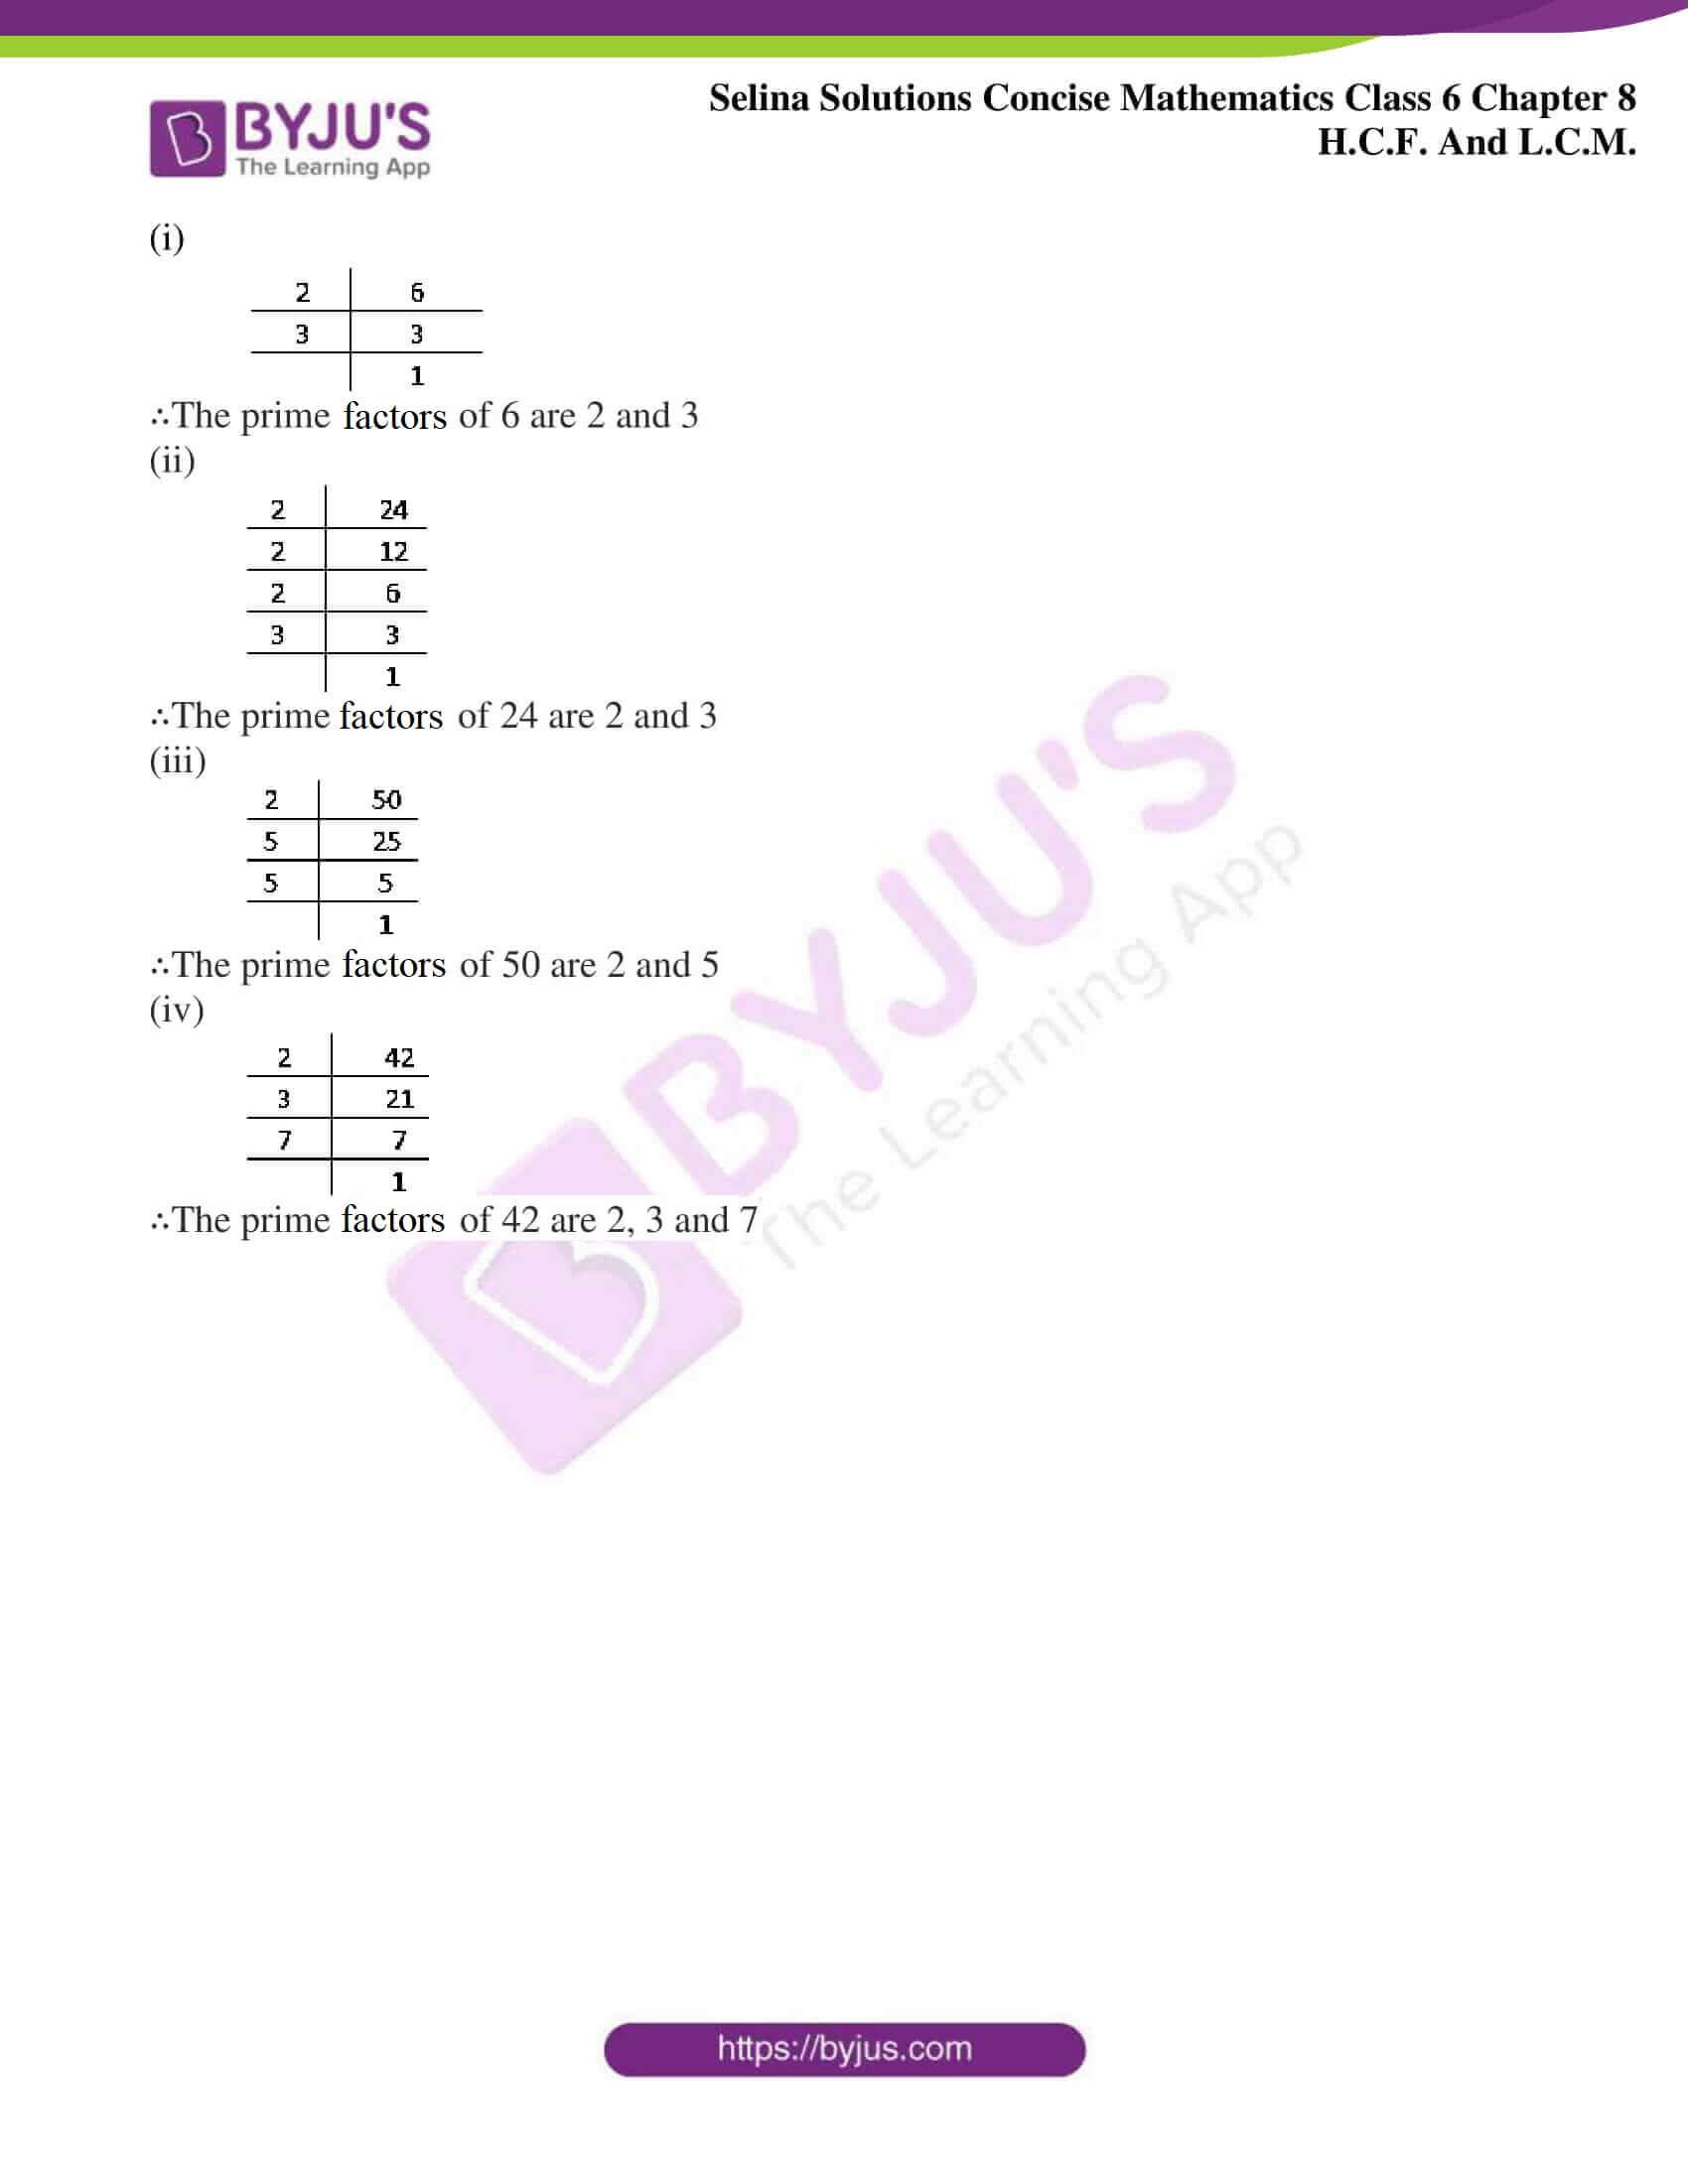 selina sol concise mathematics class 6 ch 8 ex a 3